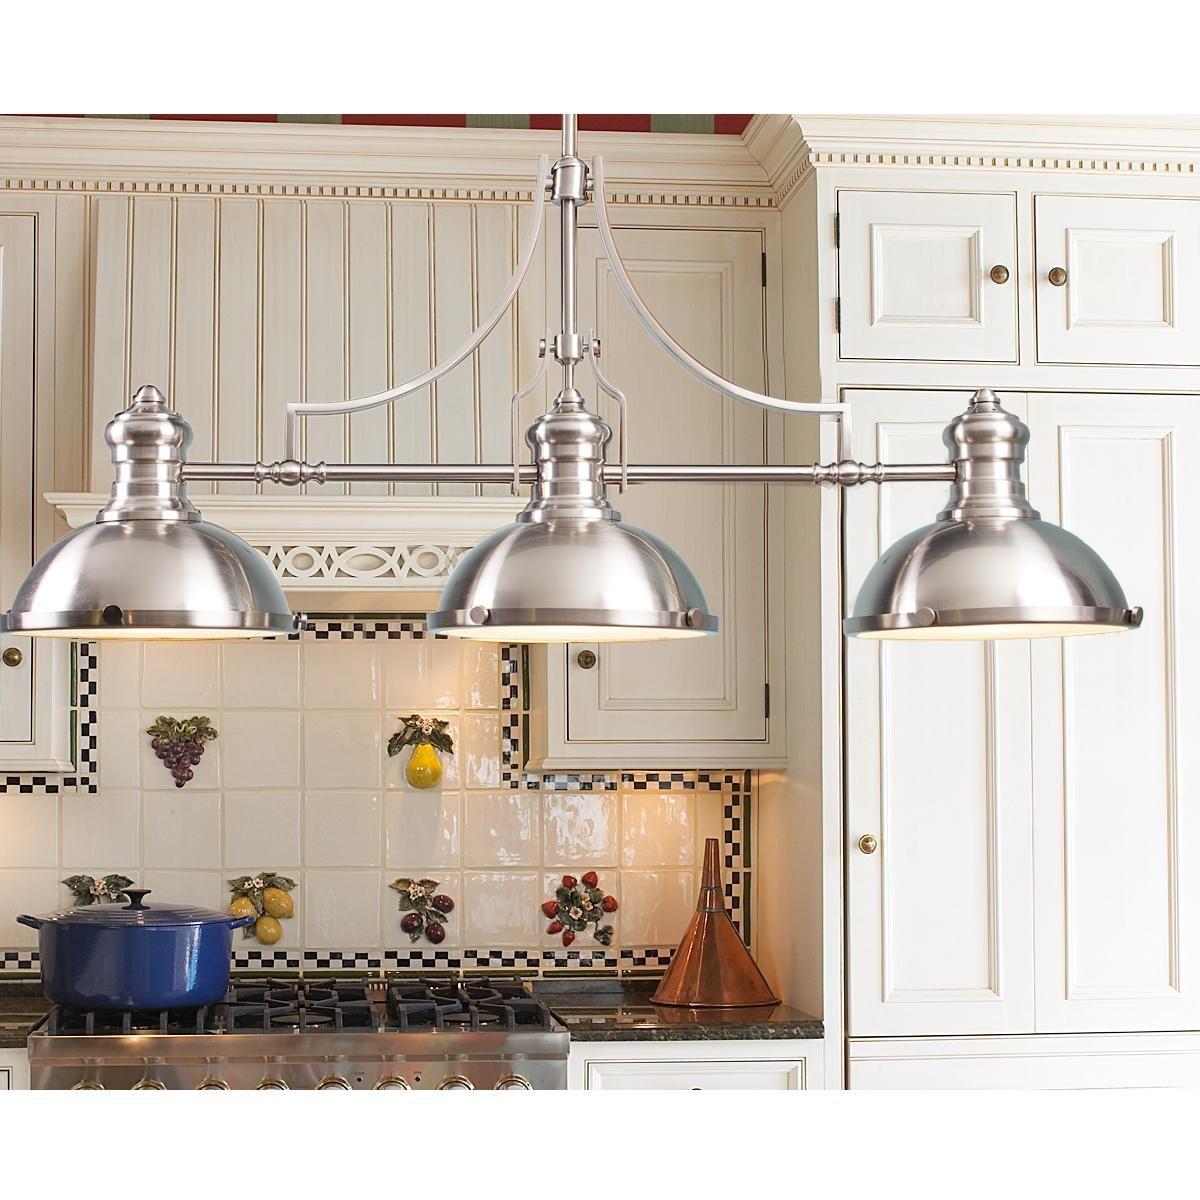 Kitchen Chandelier Ideas Small Lighting Period Pendant Island 3 Light Has